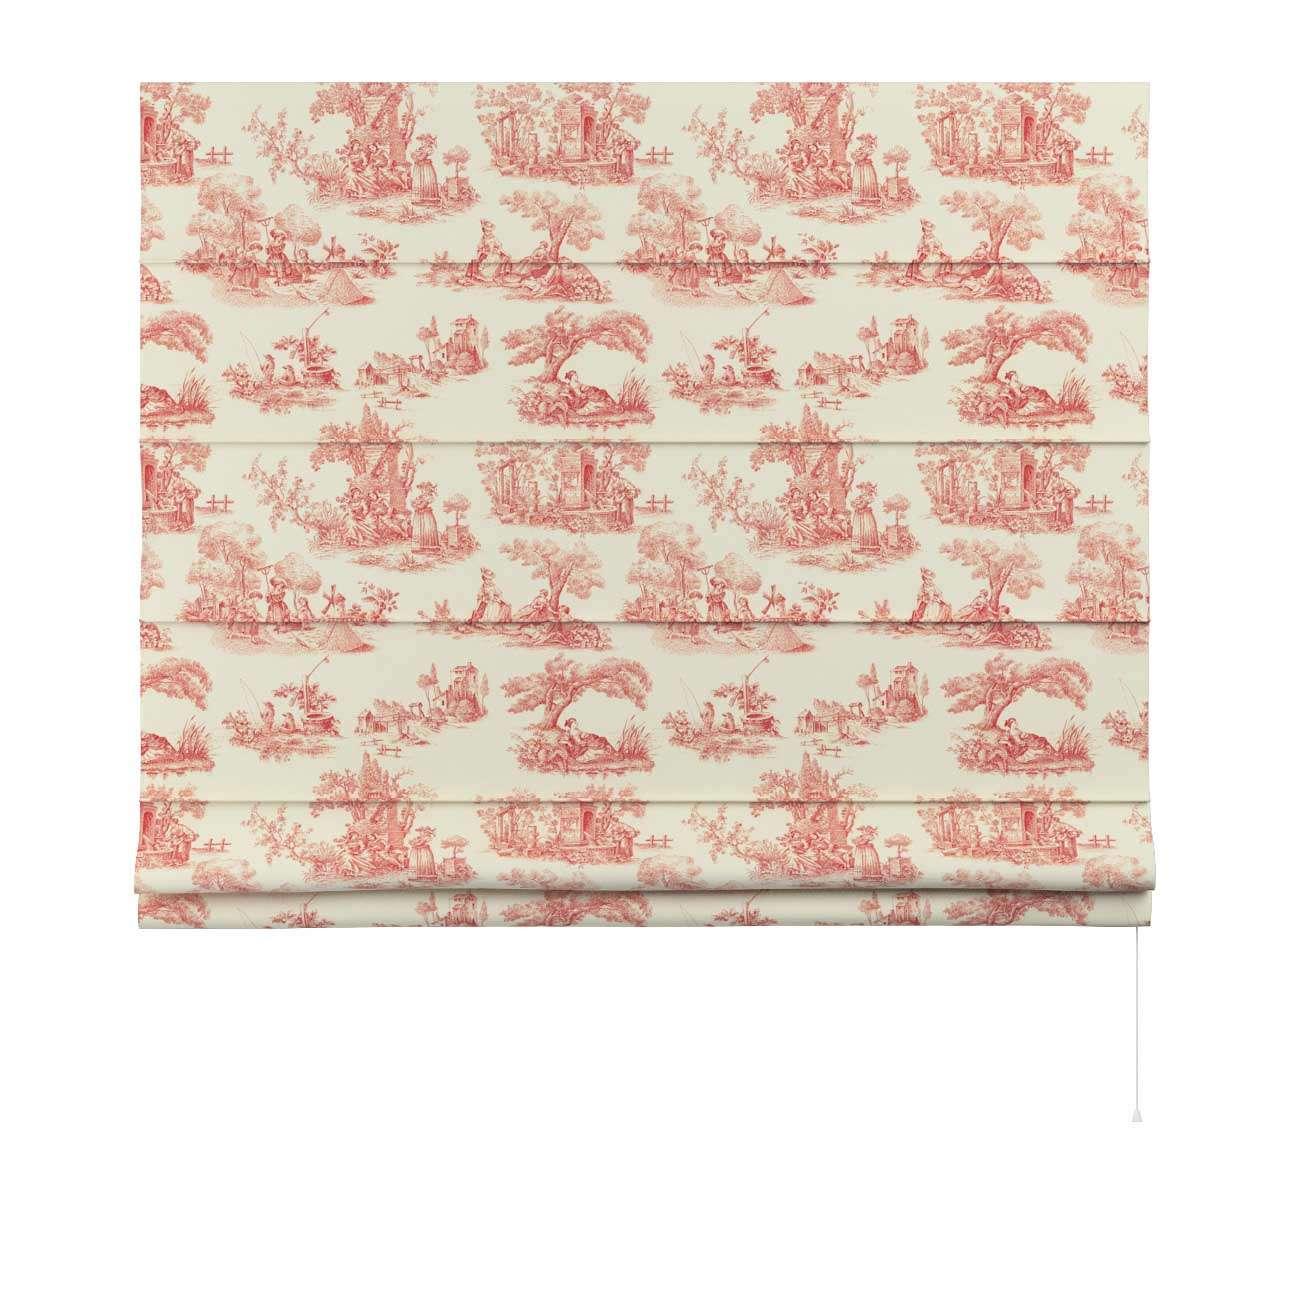 Romanetės Capri 80 x 170 cm (plotis x ilgis) kolekcijoje Avinon, audinys: 132-15